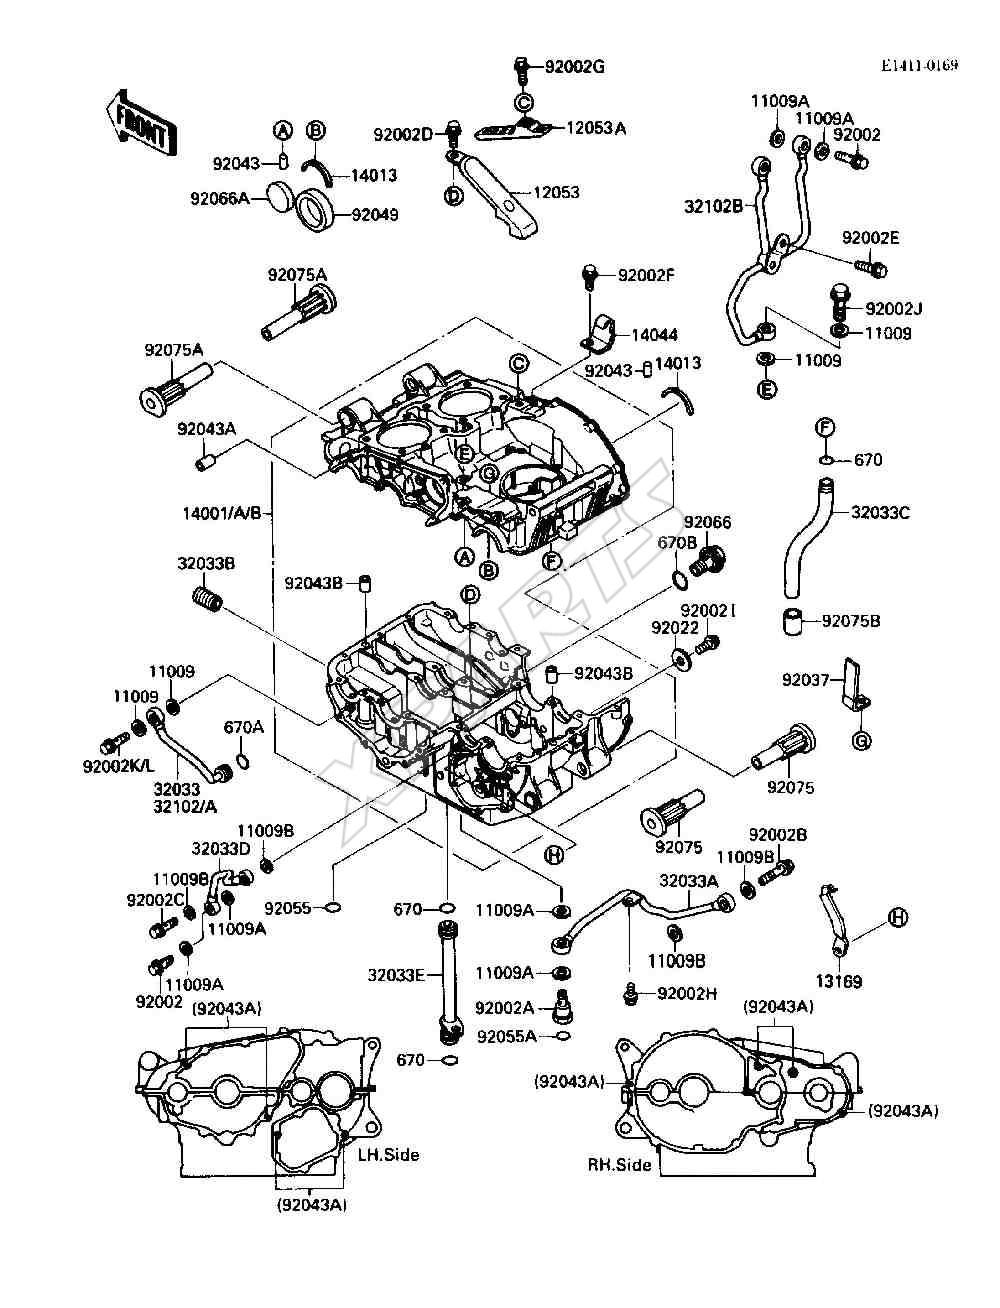 Kawasaki 454 LTD (EN450-A1) Crankcase (1985)